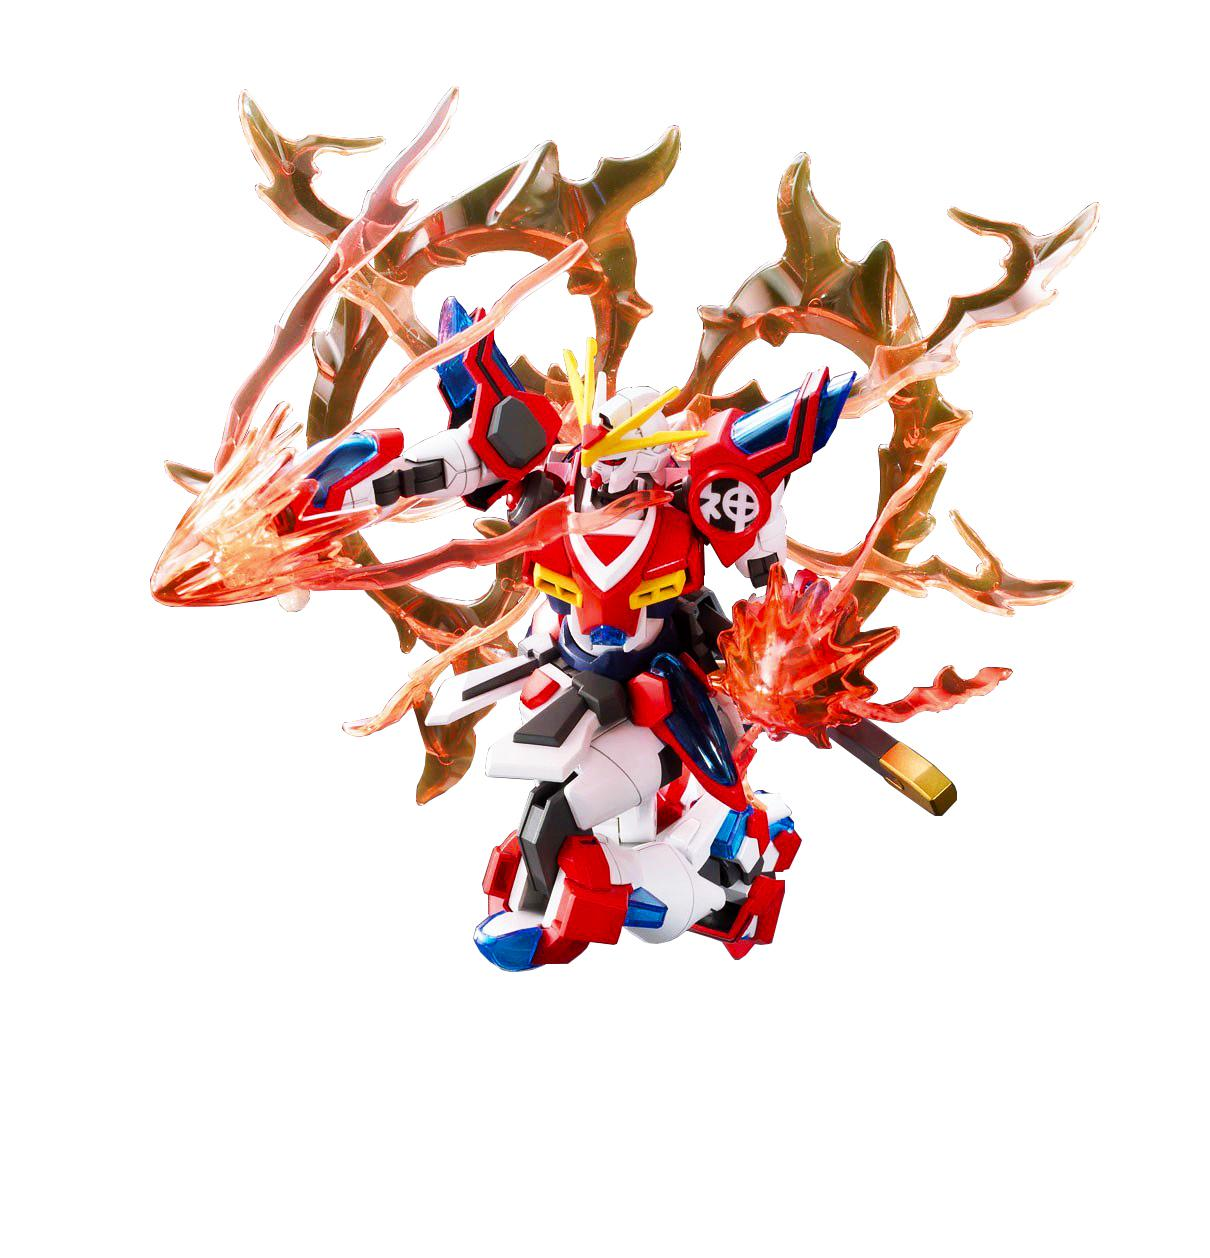 Ôn Tập Cửa Hàng Mo Hinh Lắp Rap Gundam Bandai Hgbf 043 Kamiki Burning Gundam Bandai Hg Trực Tuyến